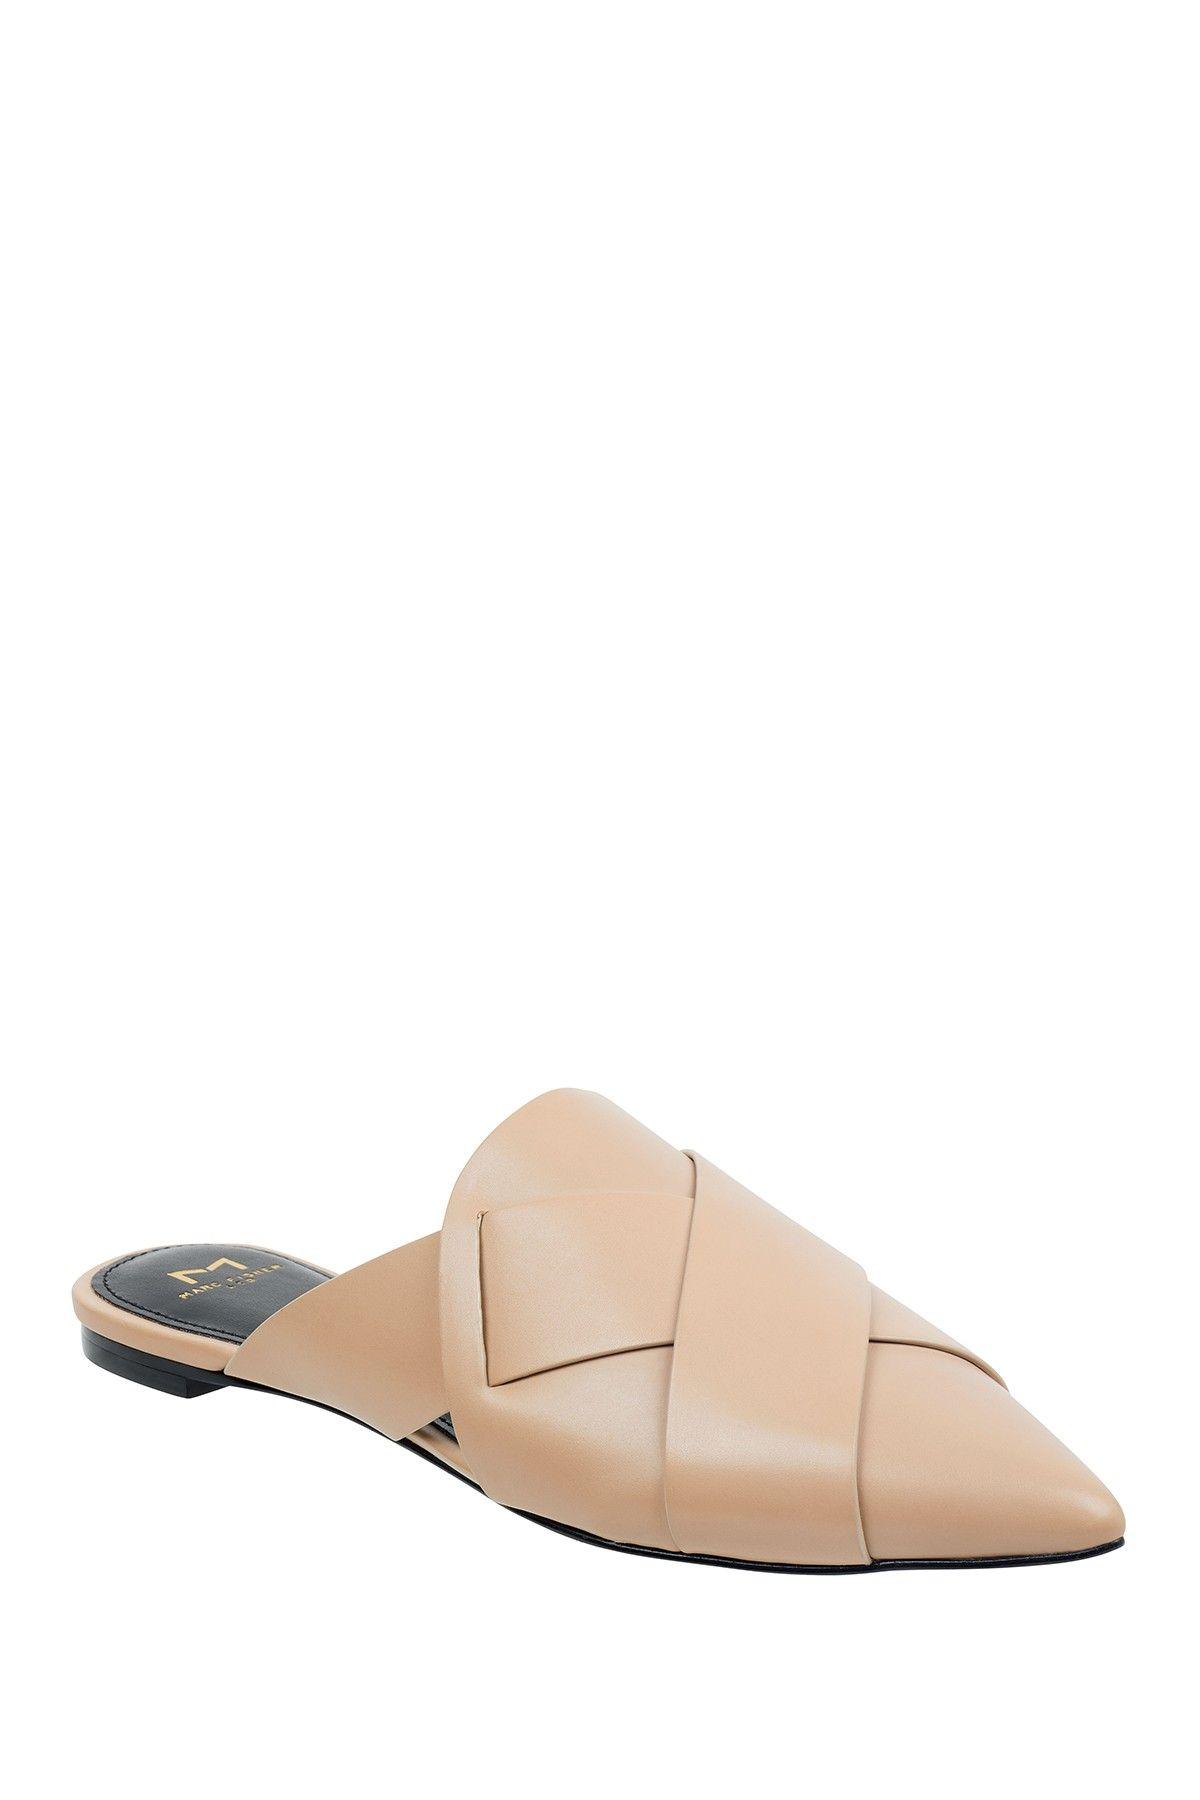 Marc Fisher Ltd Sono Pointy Toe Mule Nordstrom Rack Pointy Toe Mules Marc Fisher Ltd Pointy Toe